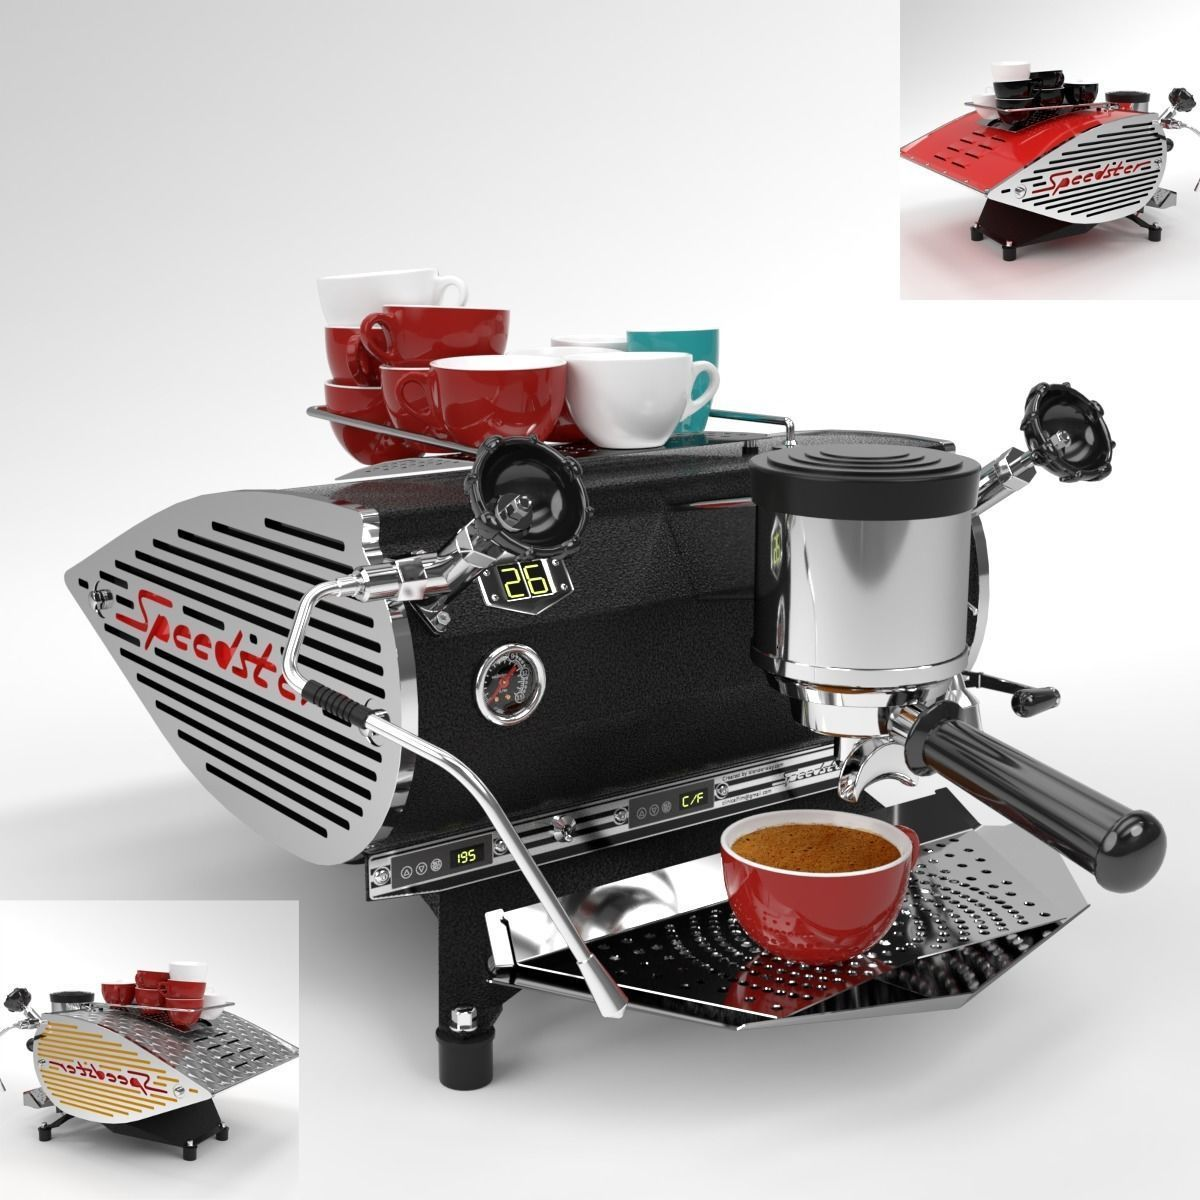 Kees Van Der Westen Coffee Machine Sdster Blender Cycles Model Obj Mtl Fbx Blend 1